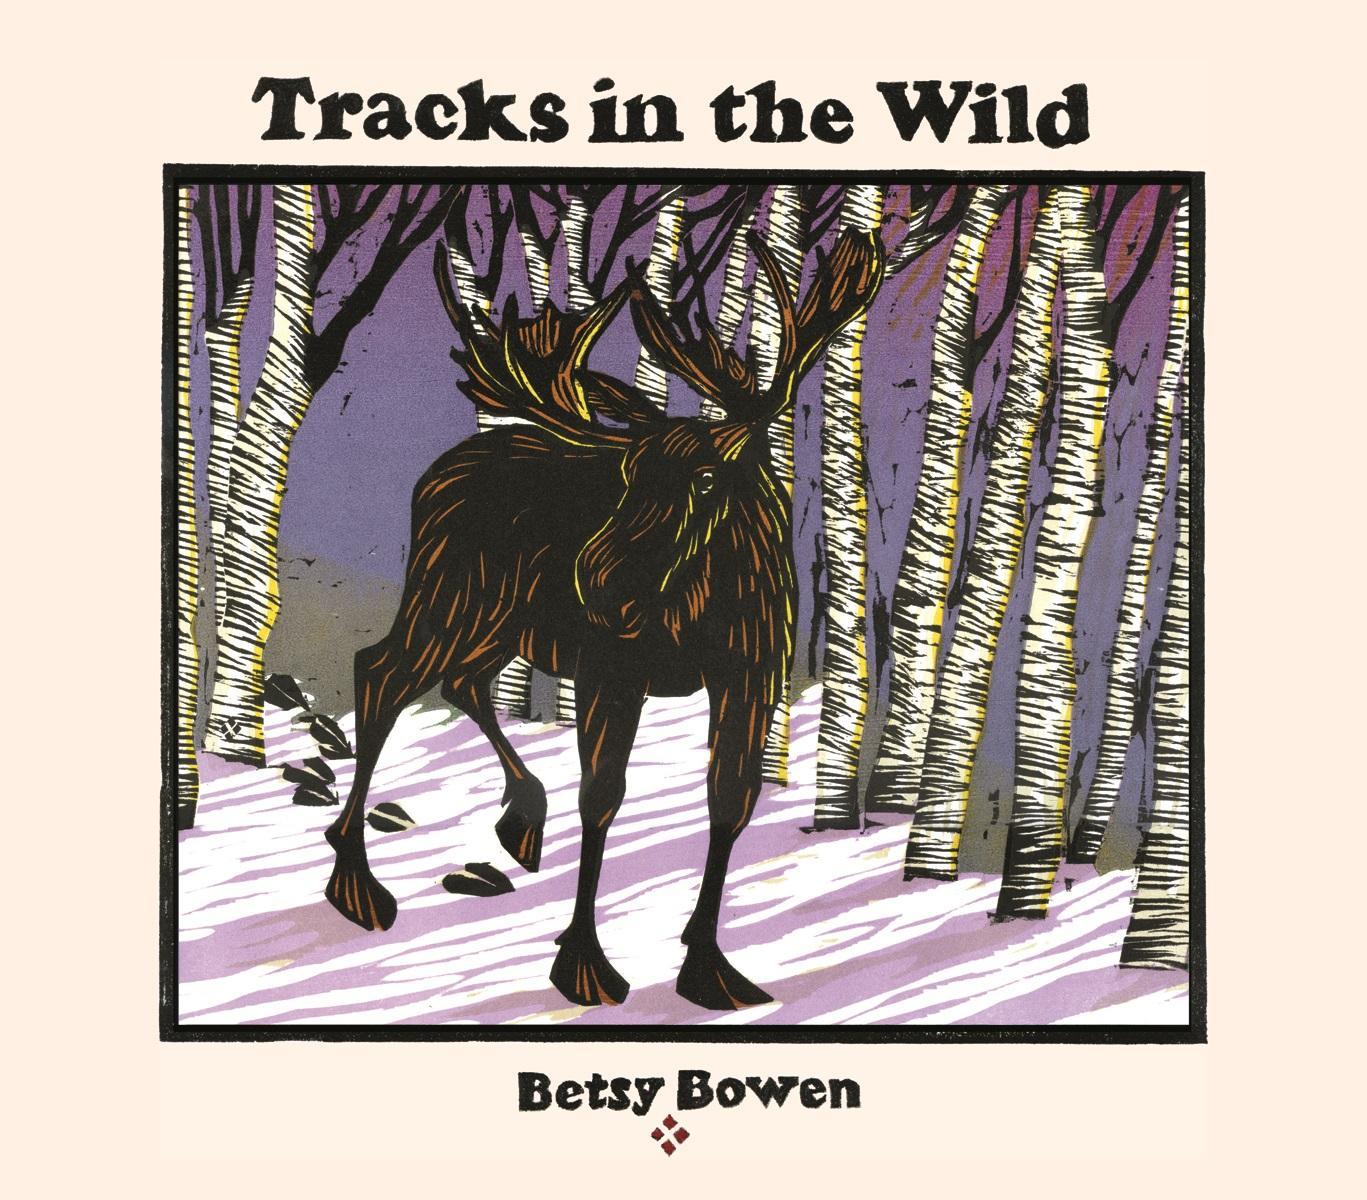 Betsy Bowen's Woodcut Illustrations